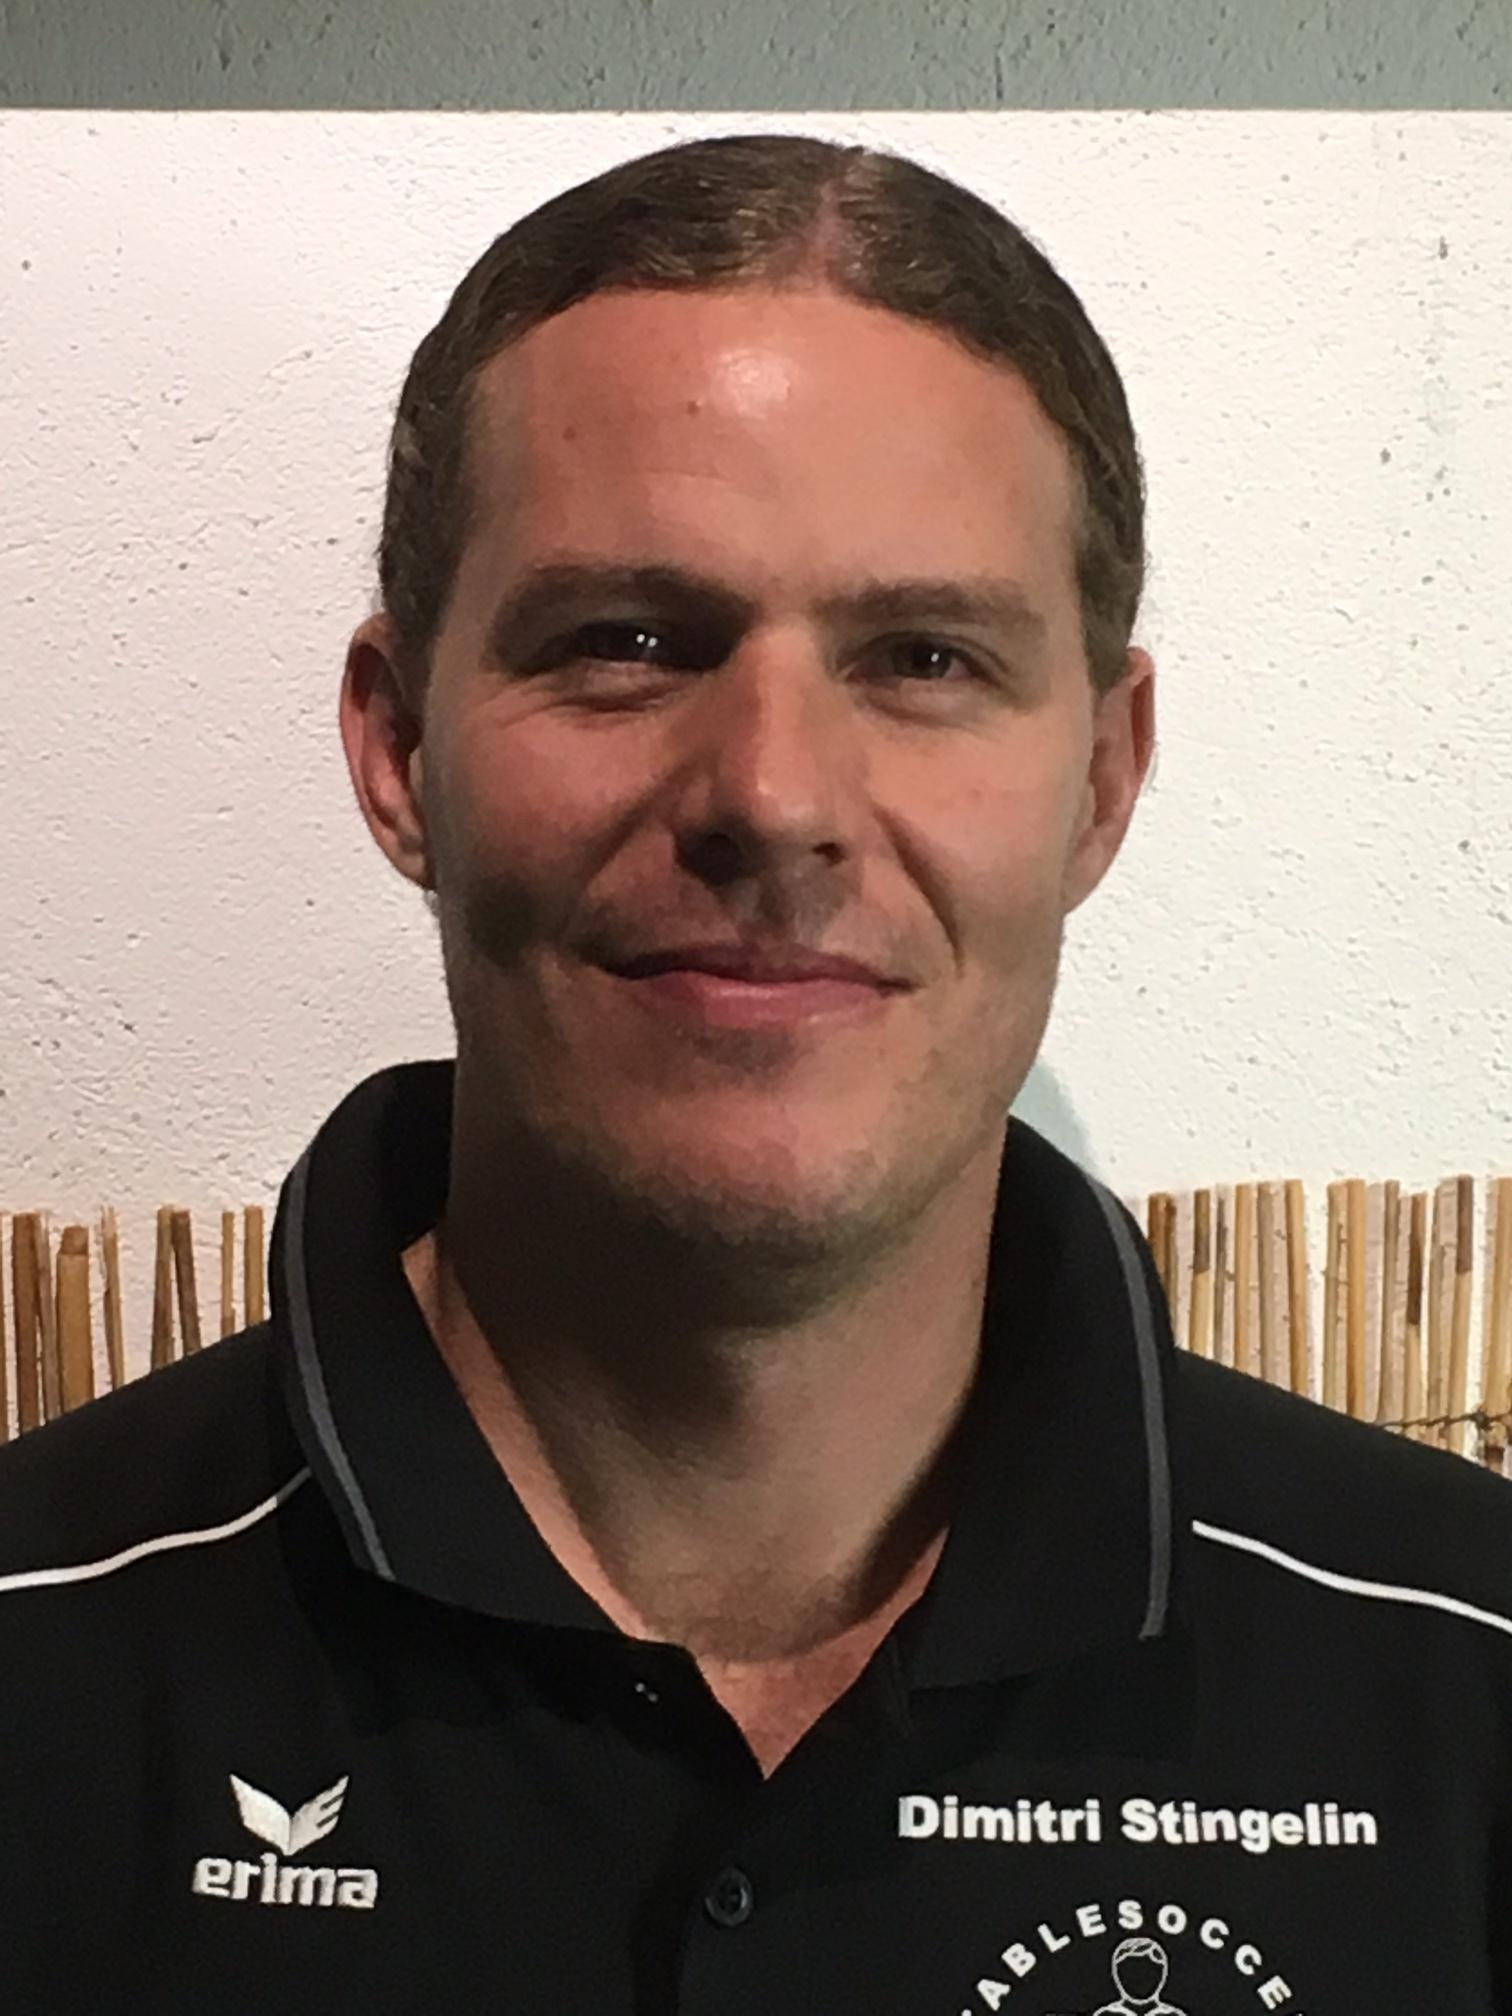 Dimitri Stingelin, Heiden AR Qualifikation: Nationale Rangliste